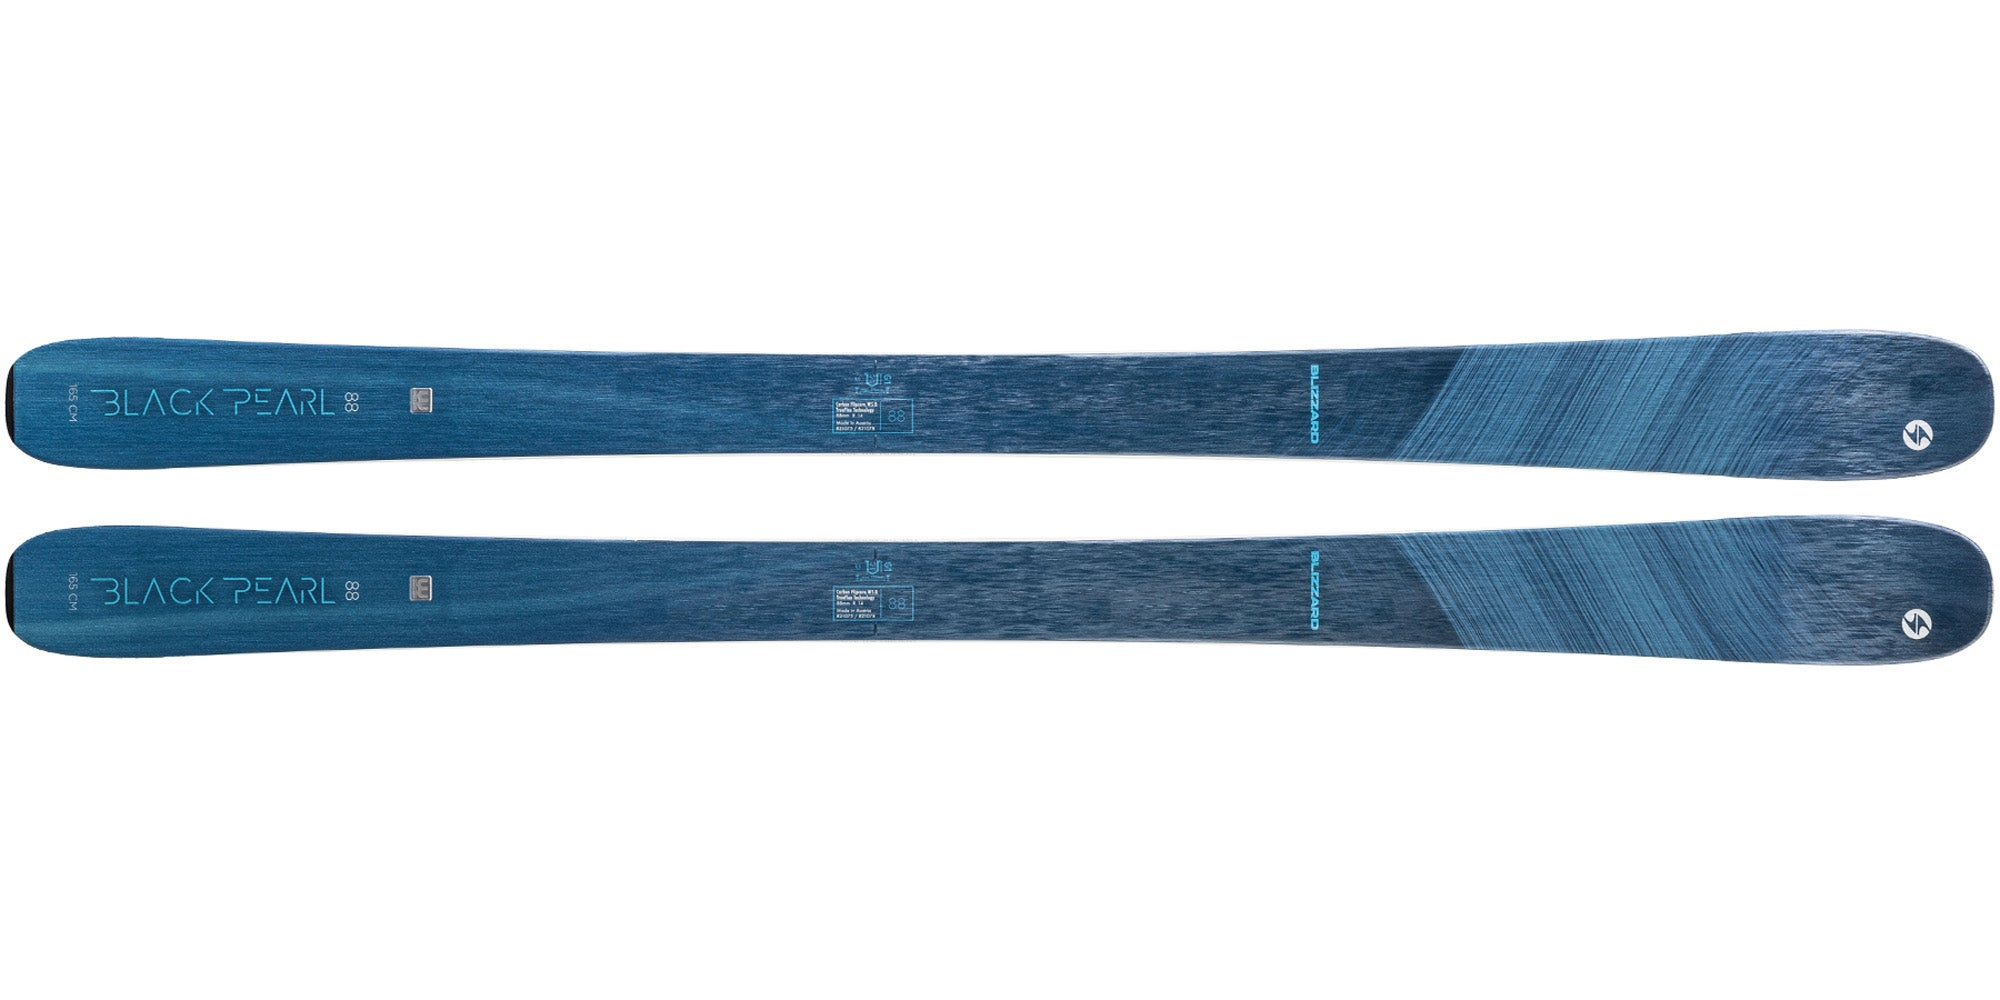 The 2021 Blizzard Black Pearl 88 Women's Frontside Ski